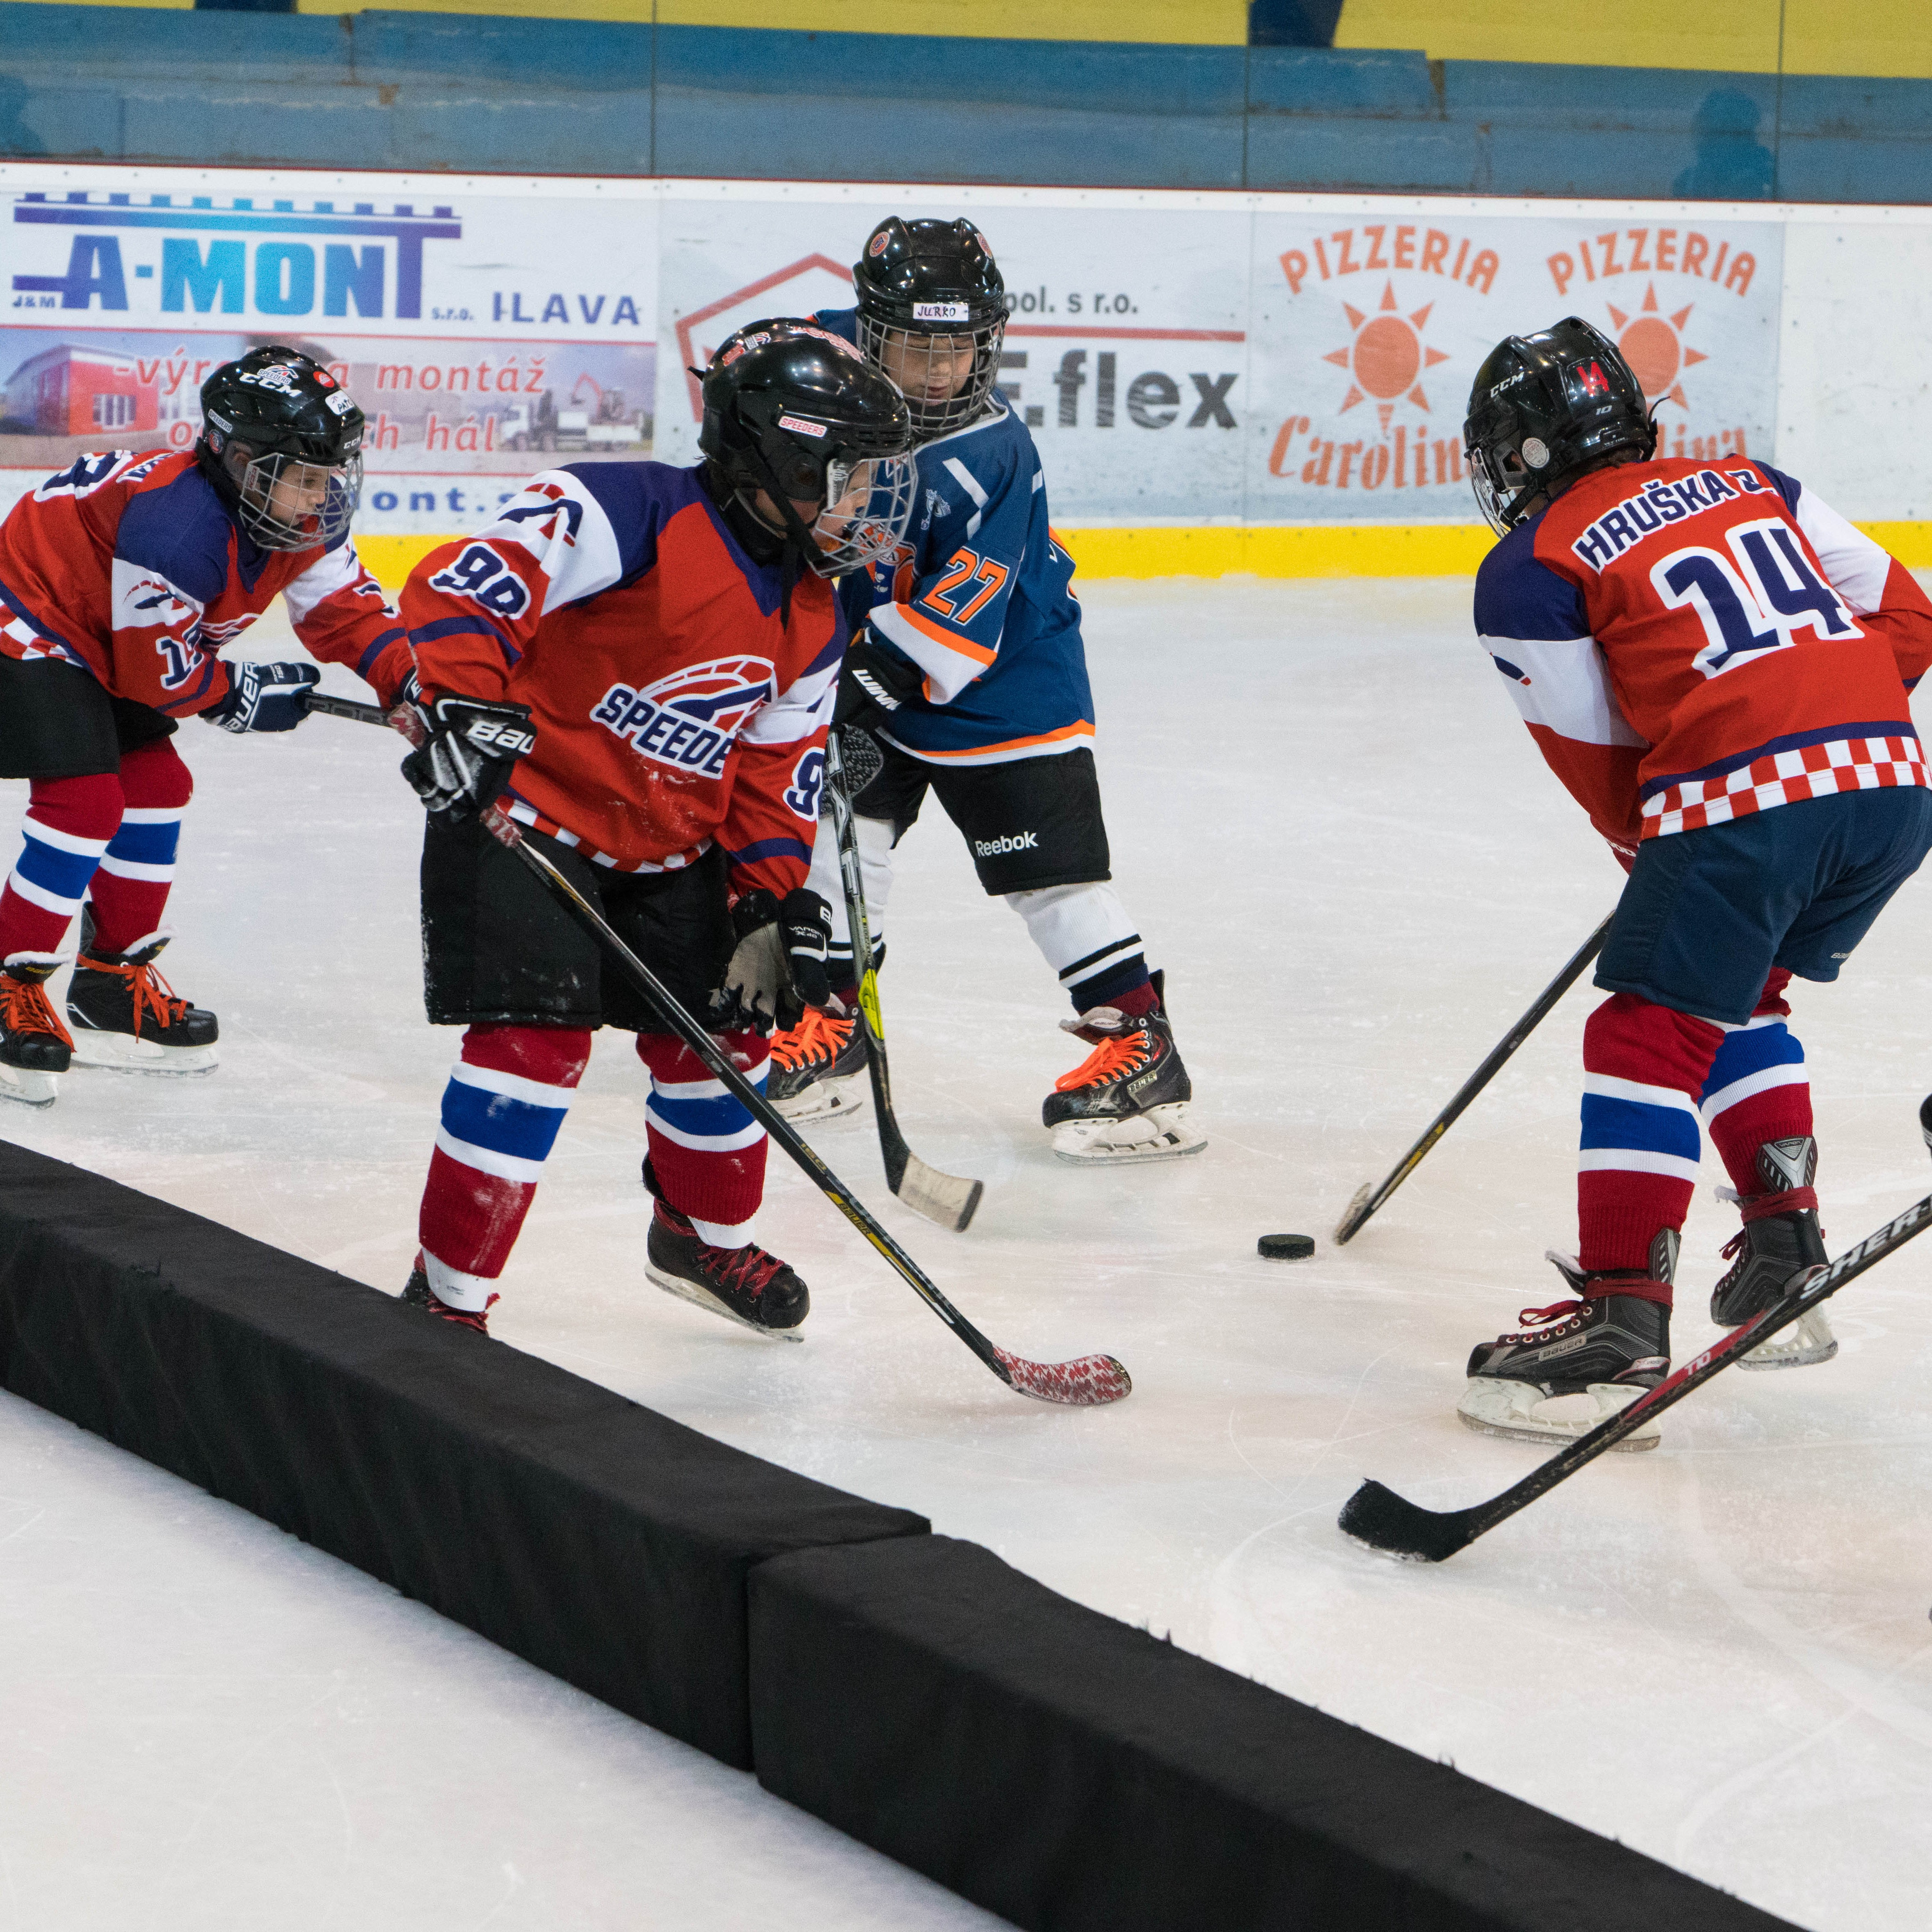 hokejovy turnaj Puchov 2.miesto speeders bratislava 3